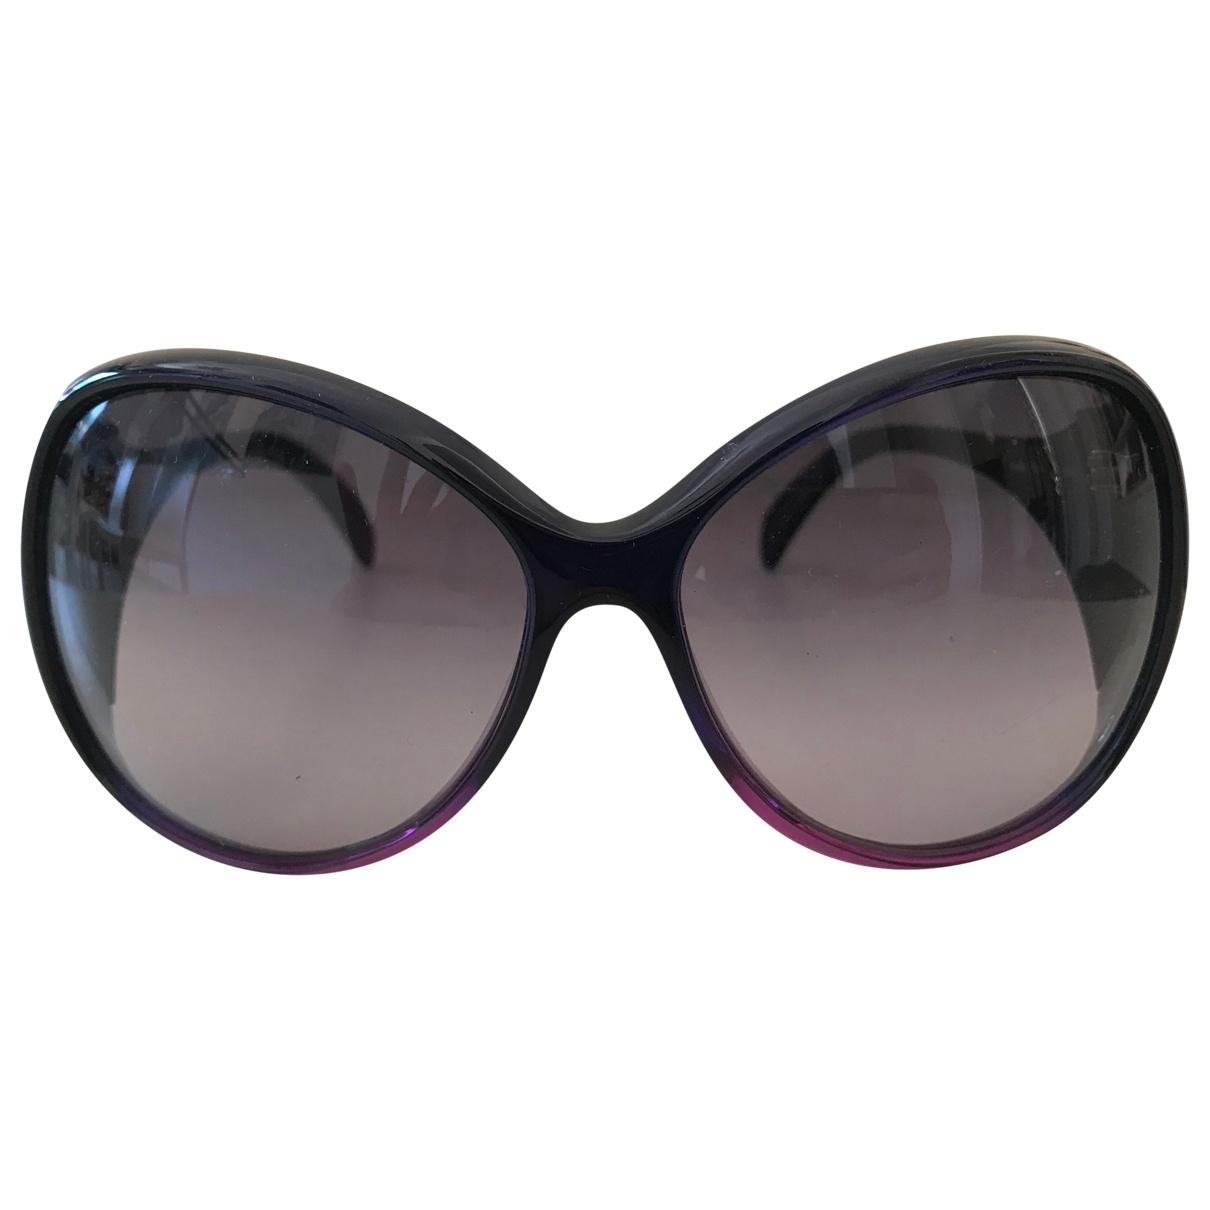 Emilio Pucci \N Purple Sunglasses for Women M International